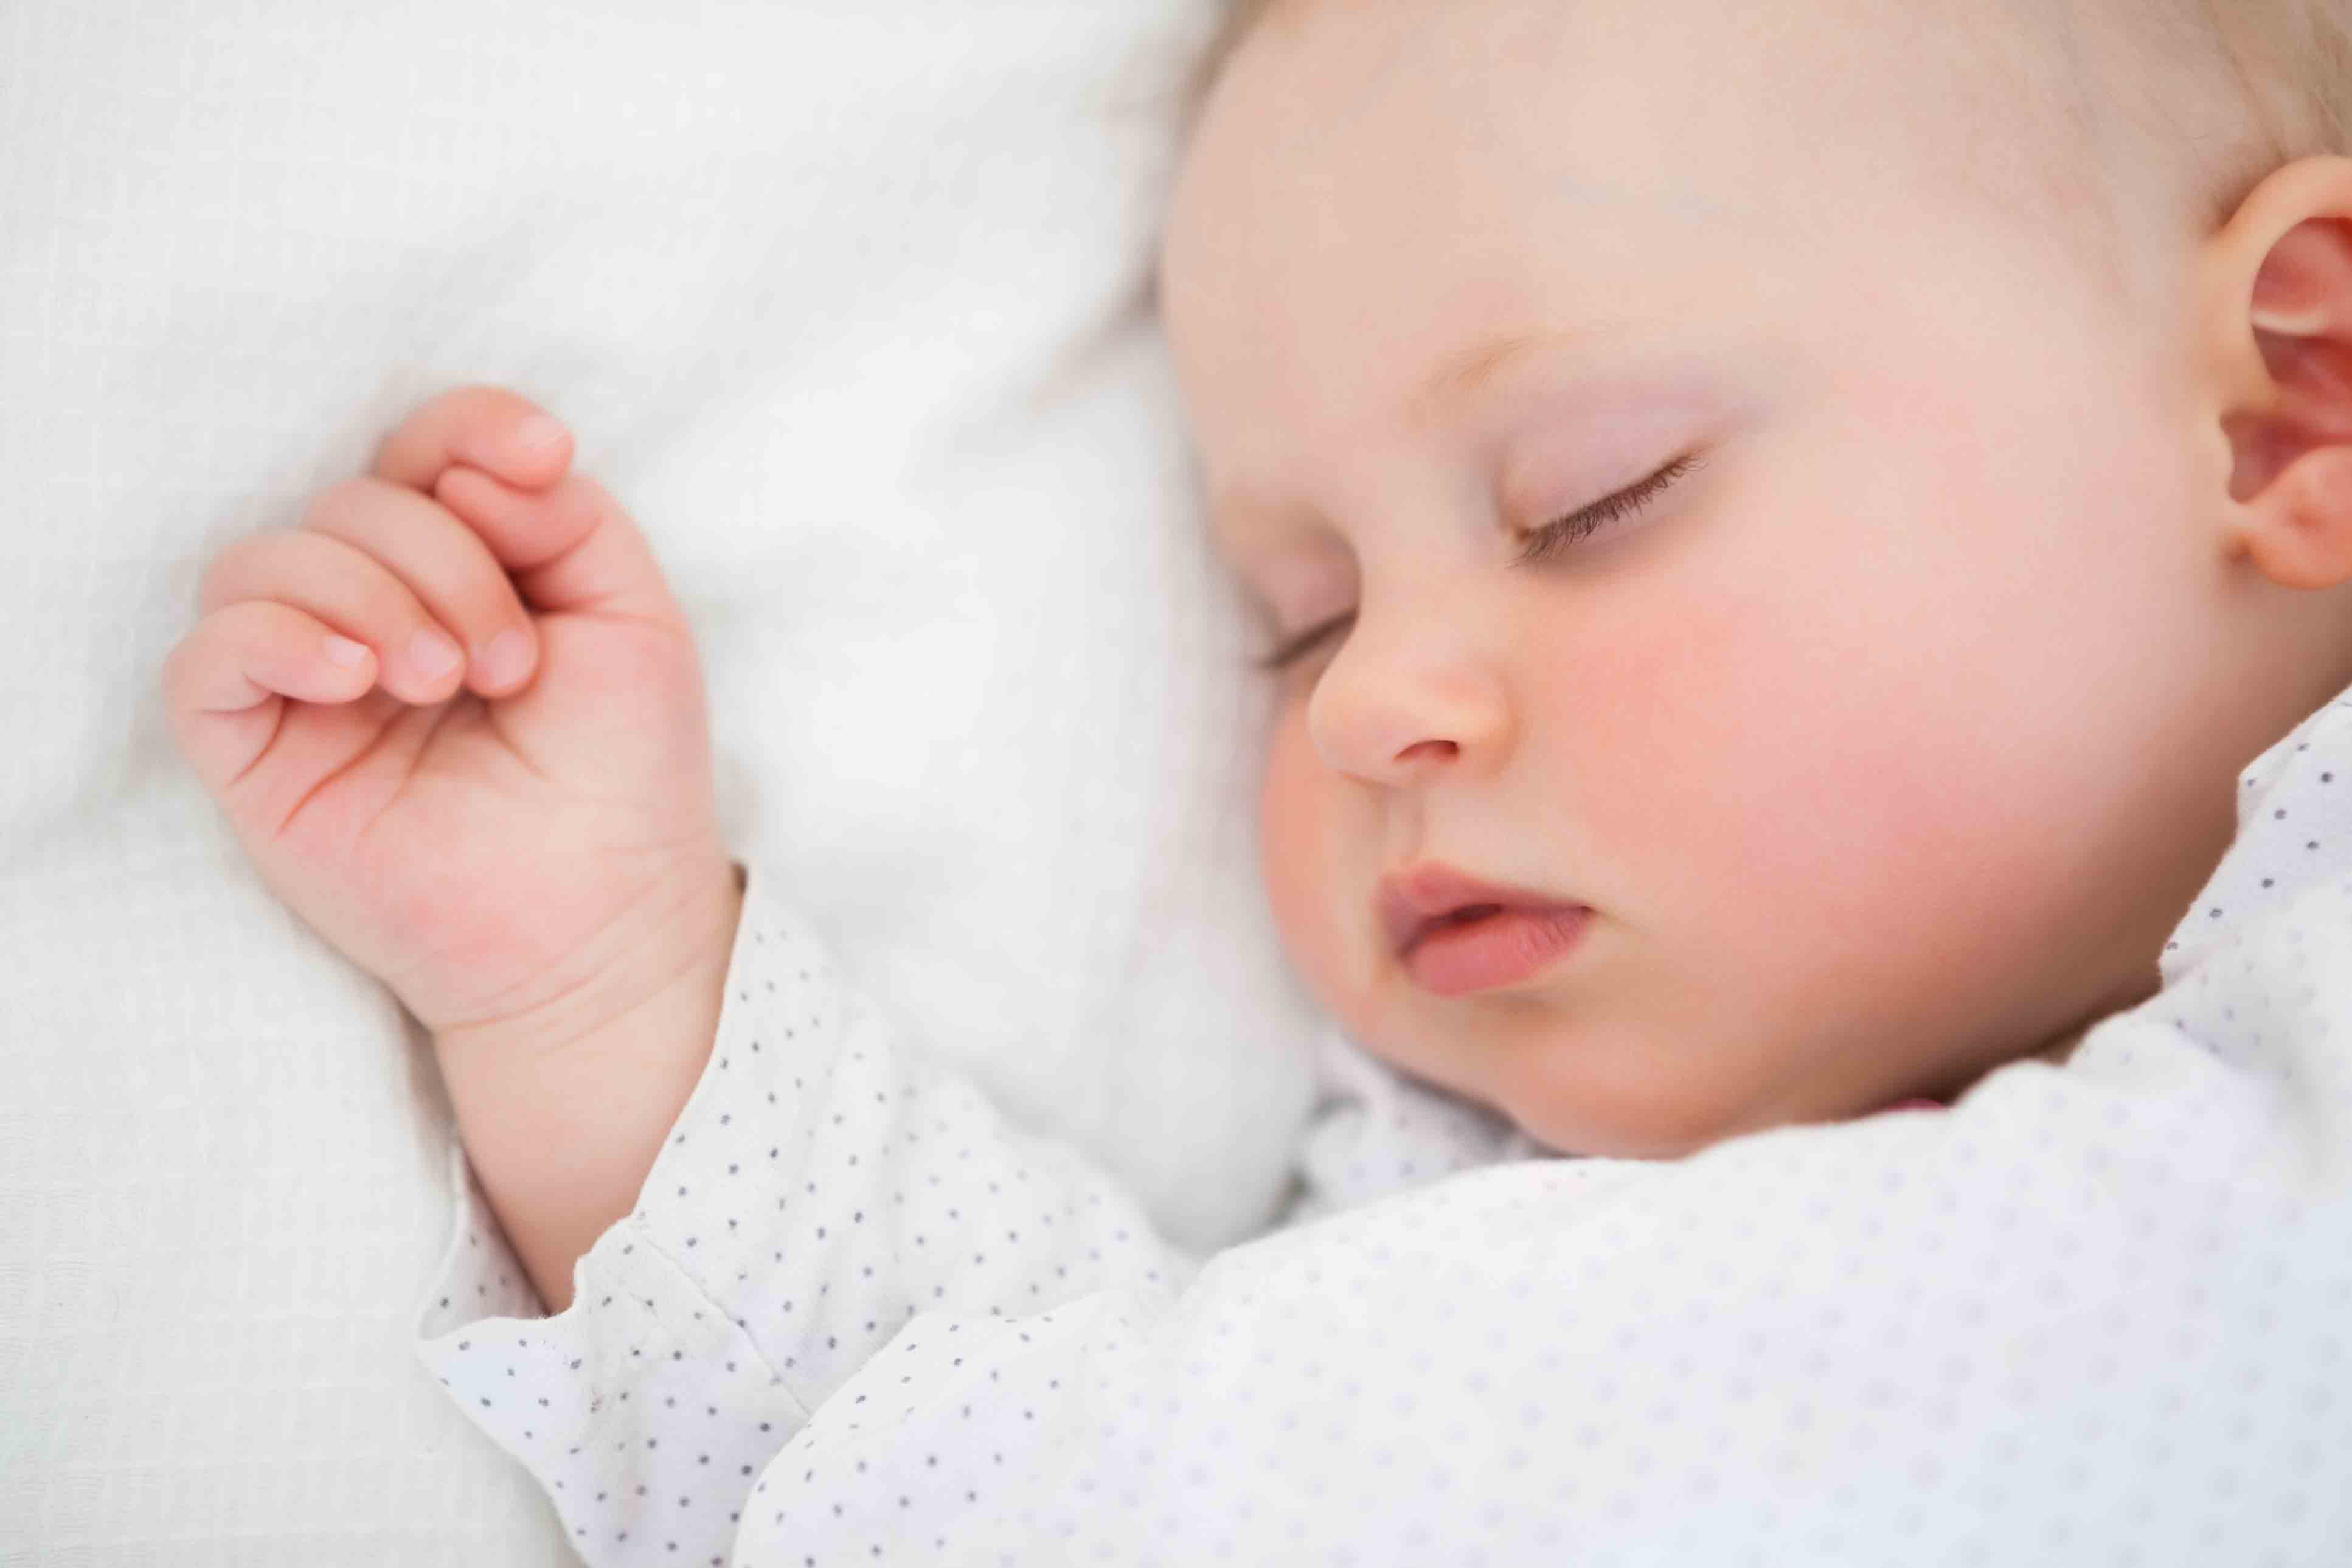 Baby Sleep Training: Help Your Baby to Sleep Through the Night